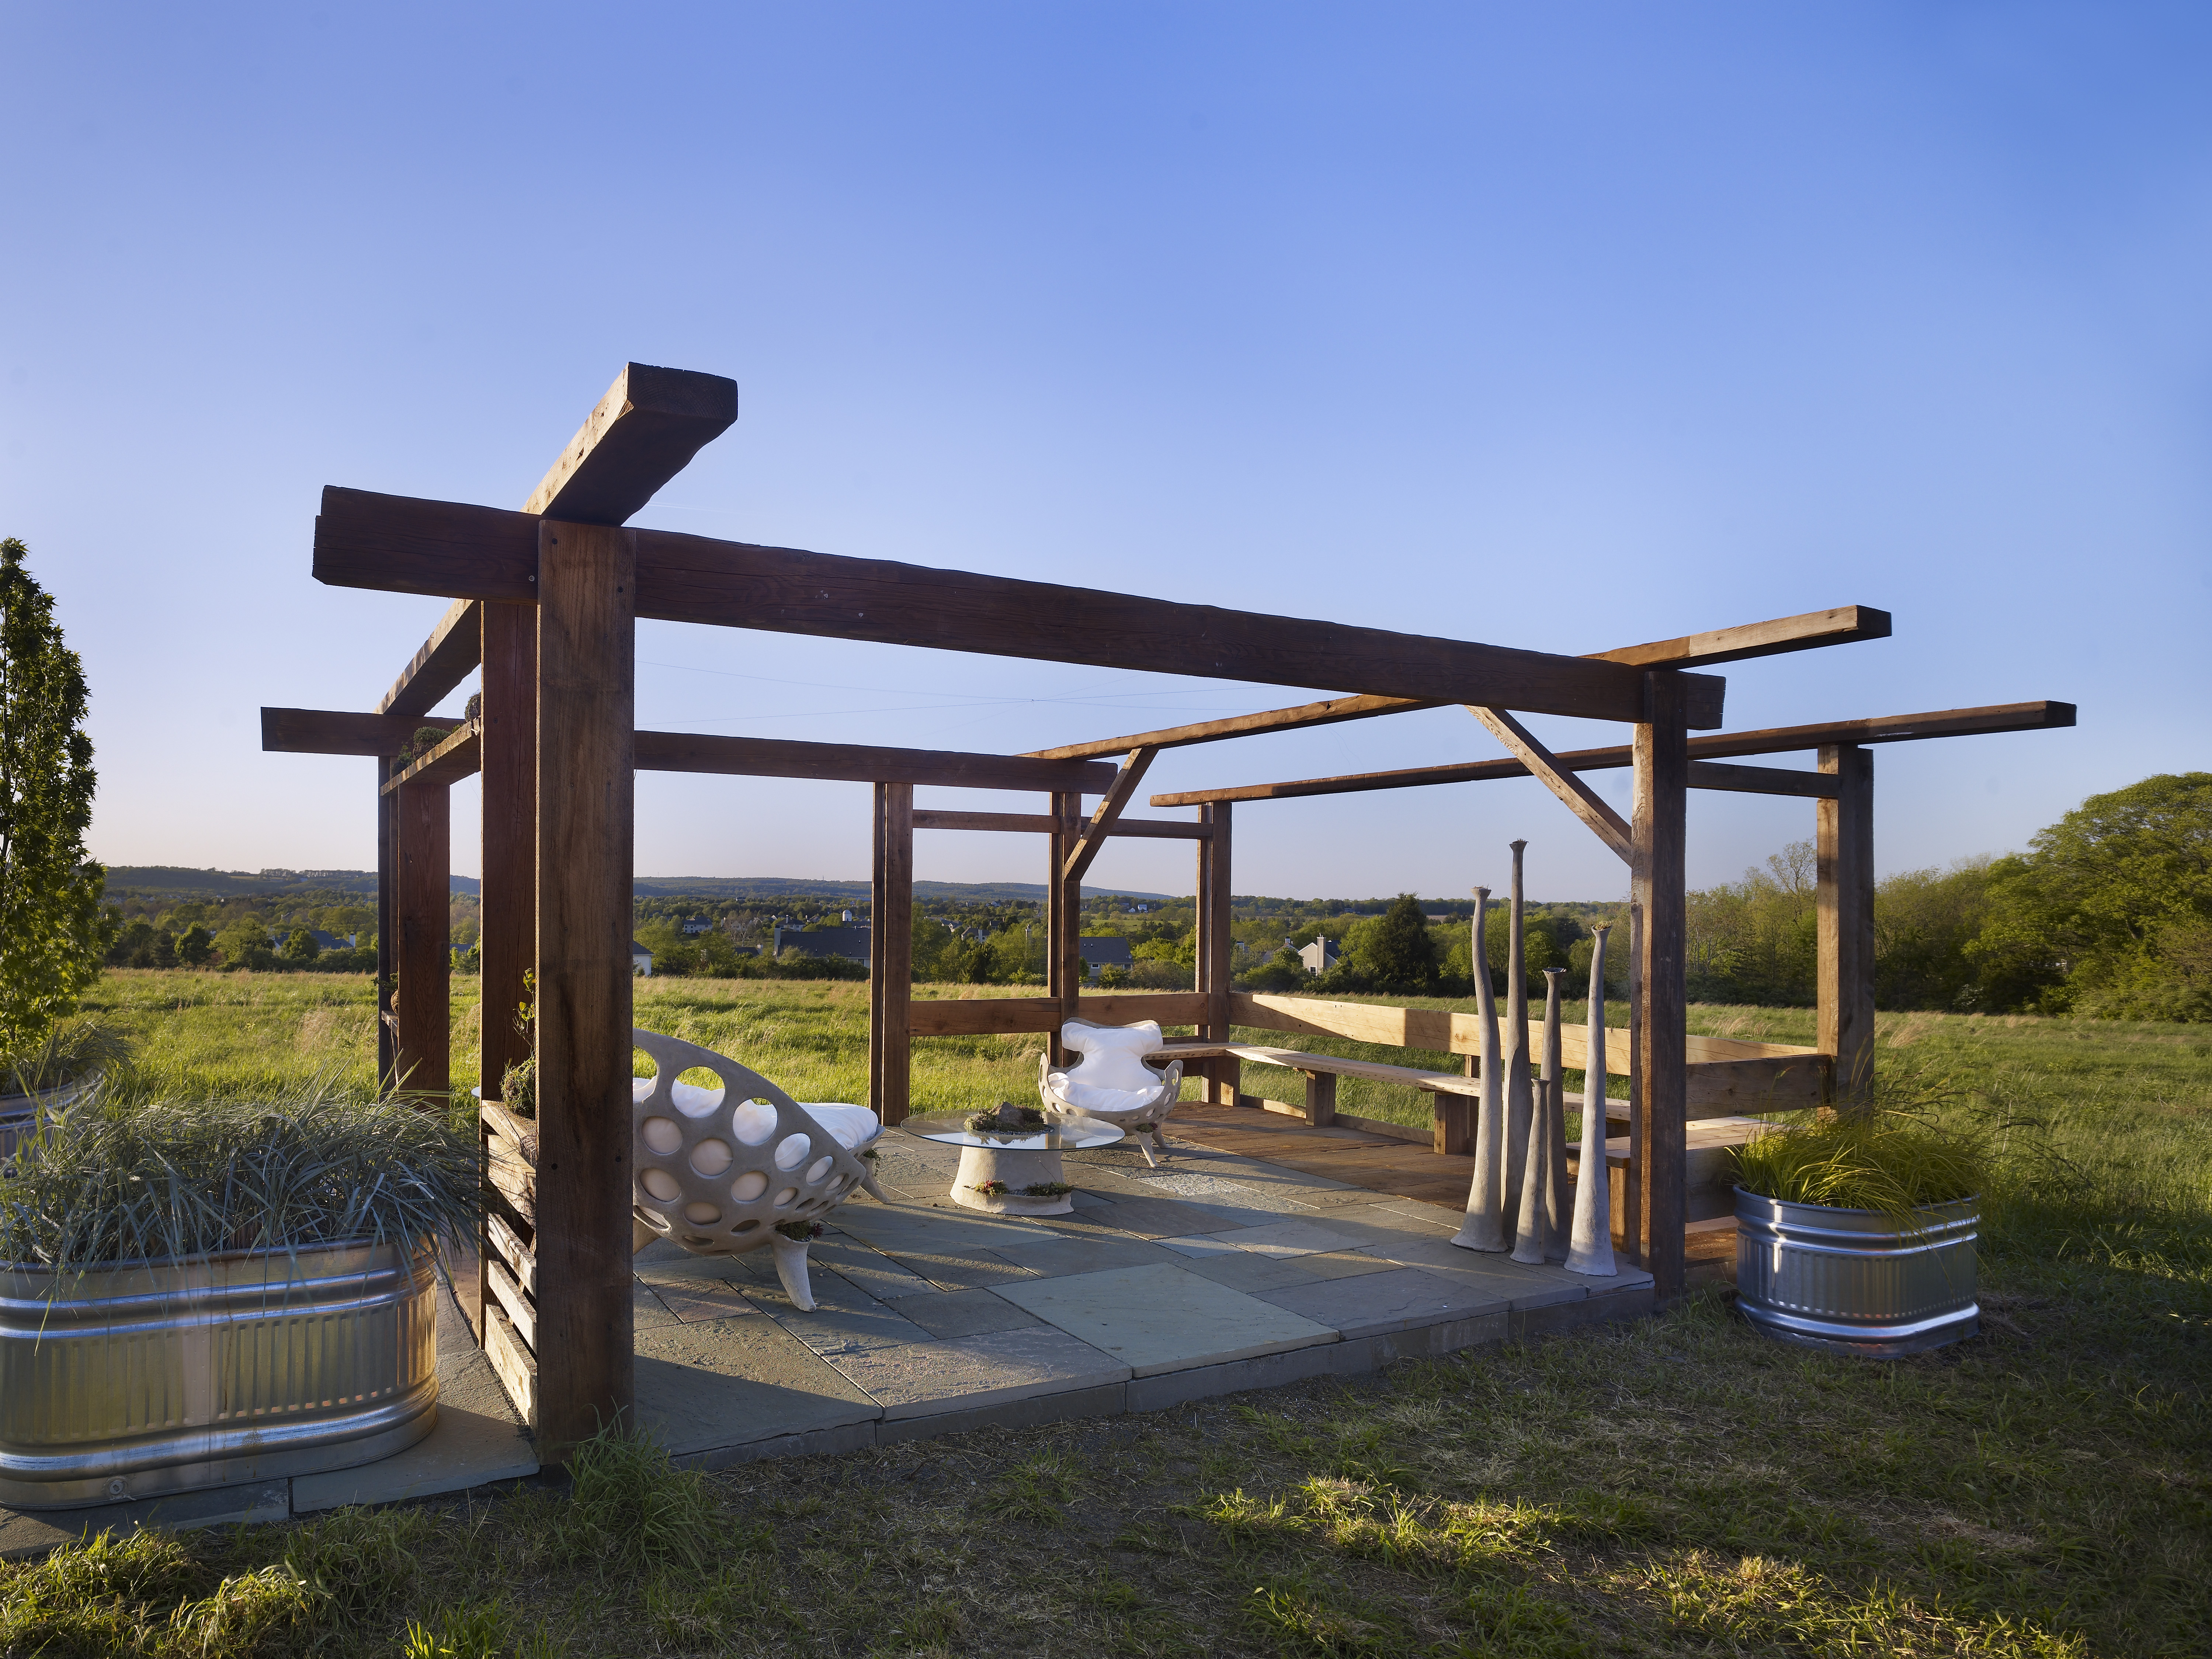 Garden Pavilion by Material Design + Build